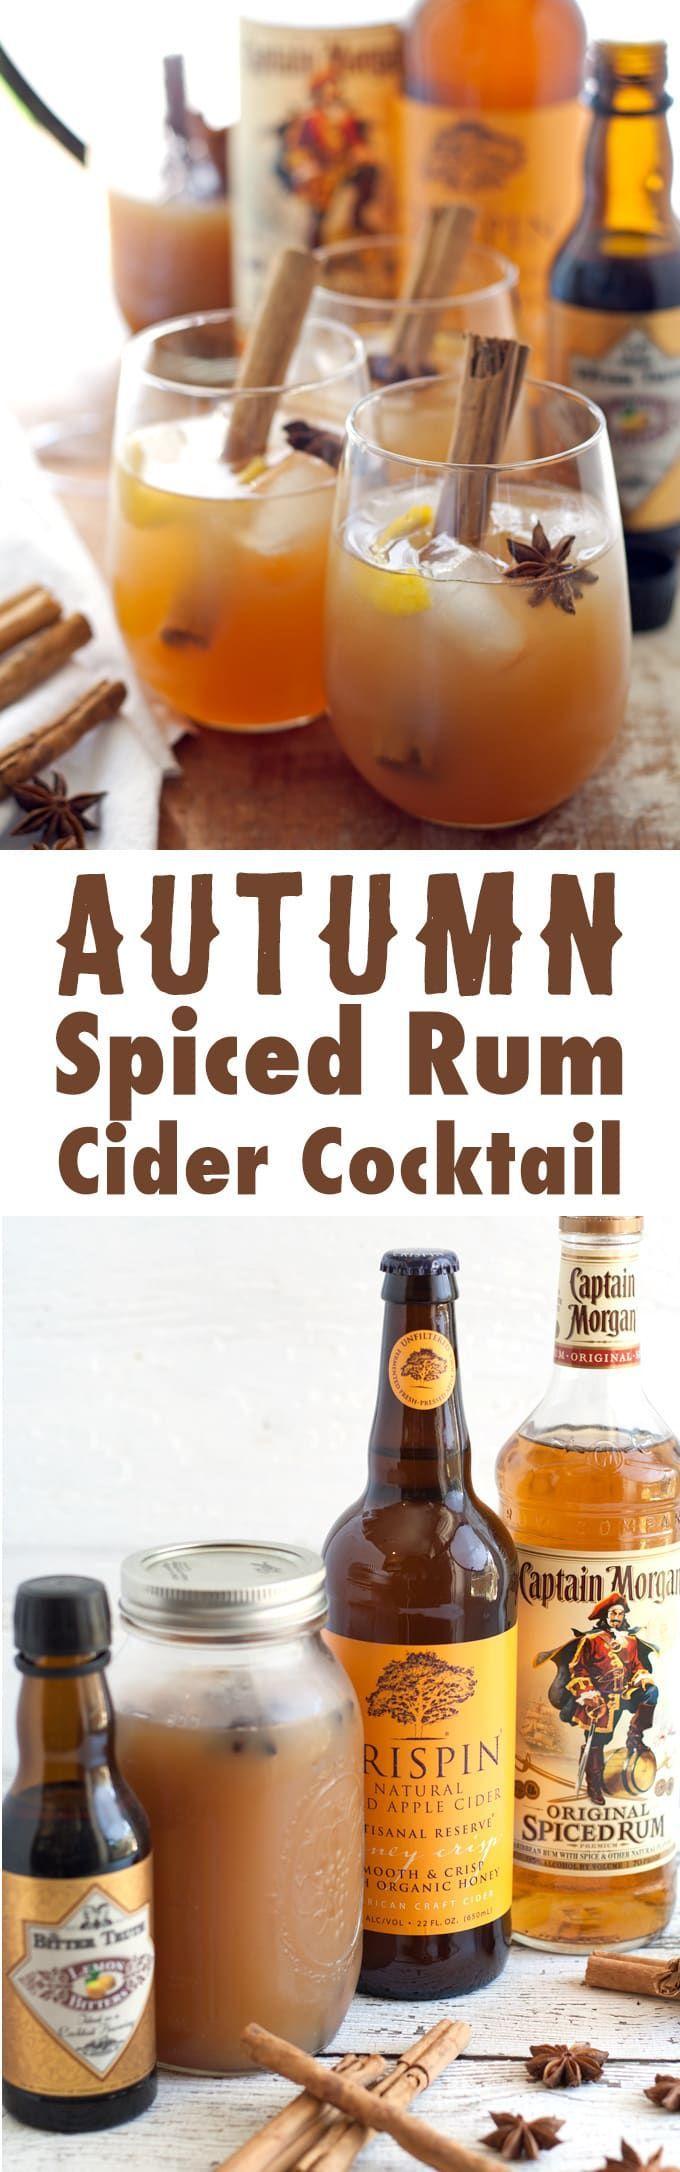 2207 Best Cocktail Drink Recipes Images On Pinterest